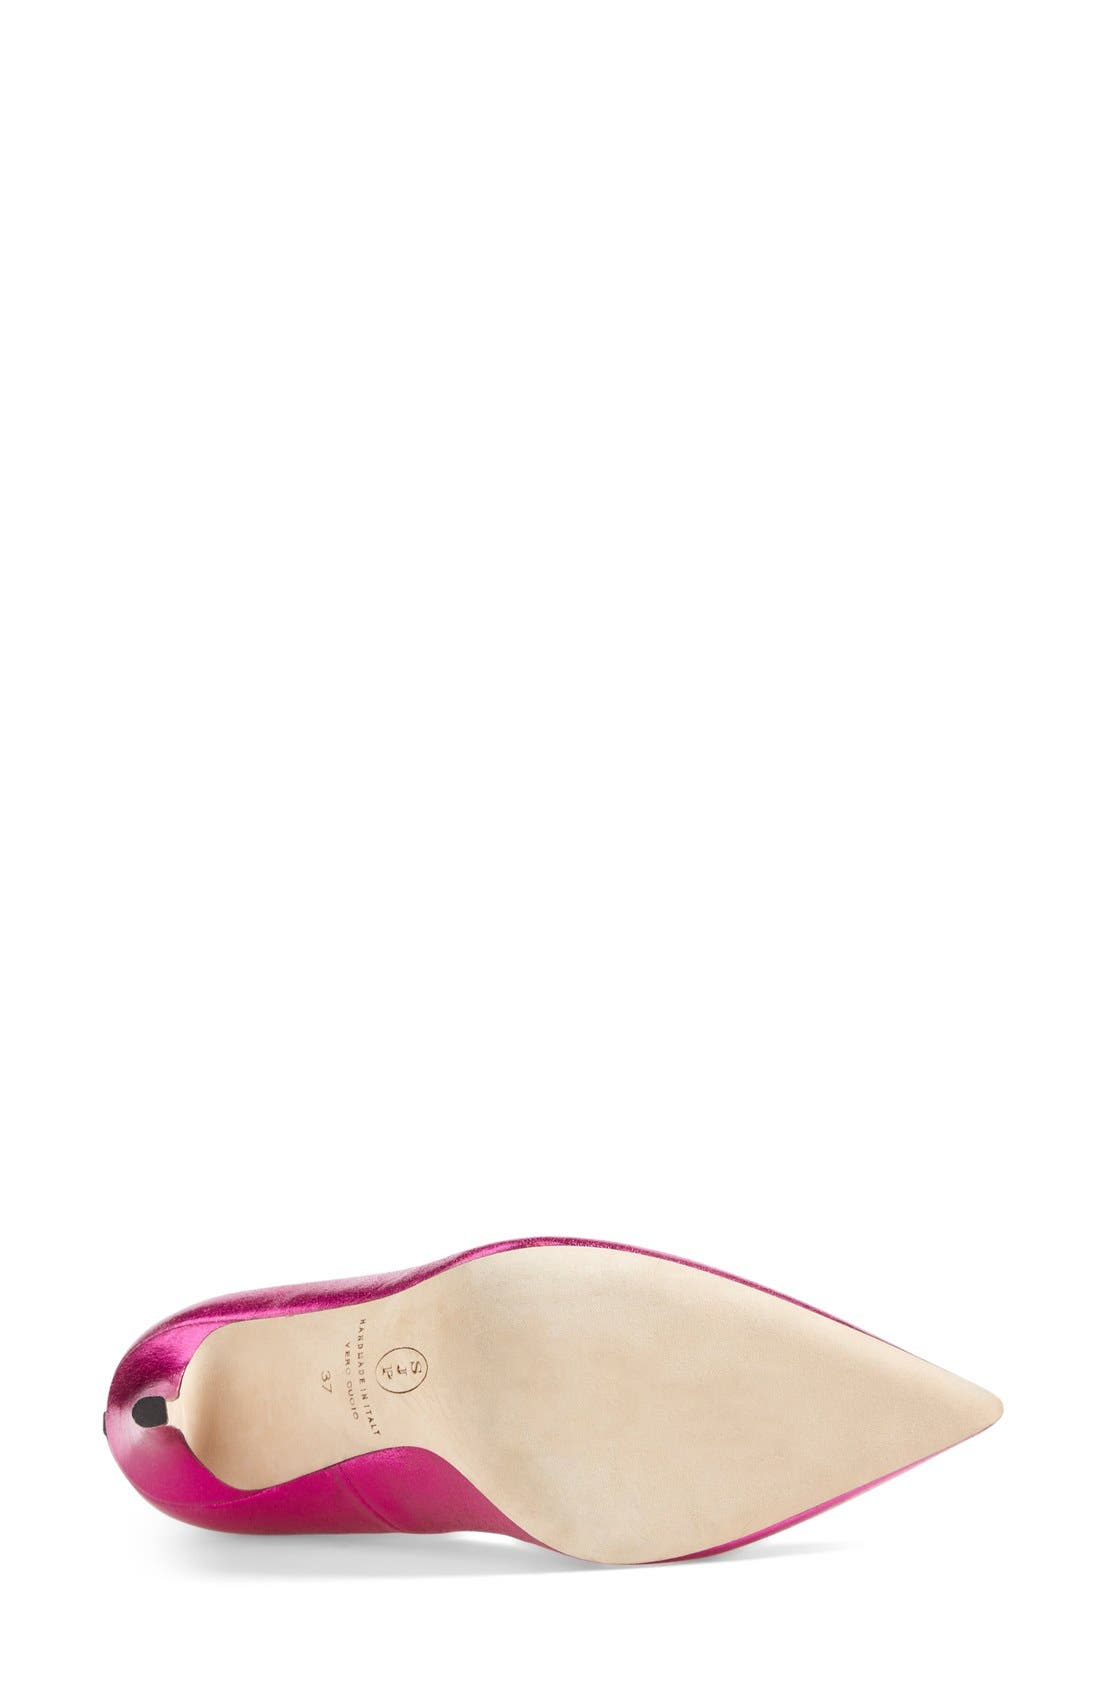 Alternate Image 4  - SJP by Sarah Jessica Parker 'Fawn 100' Pump (Women)